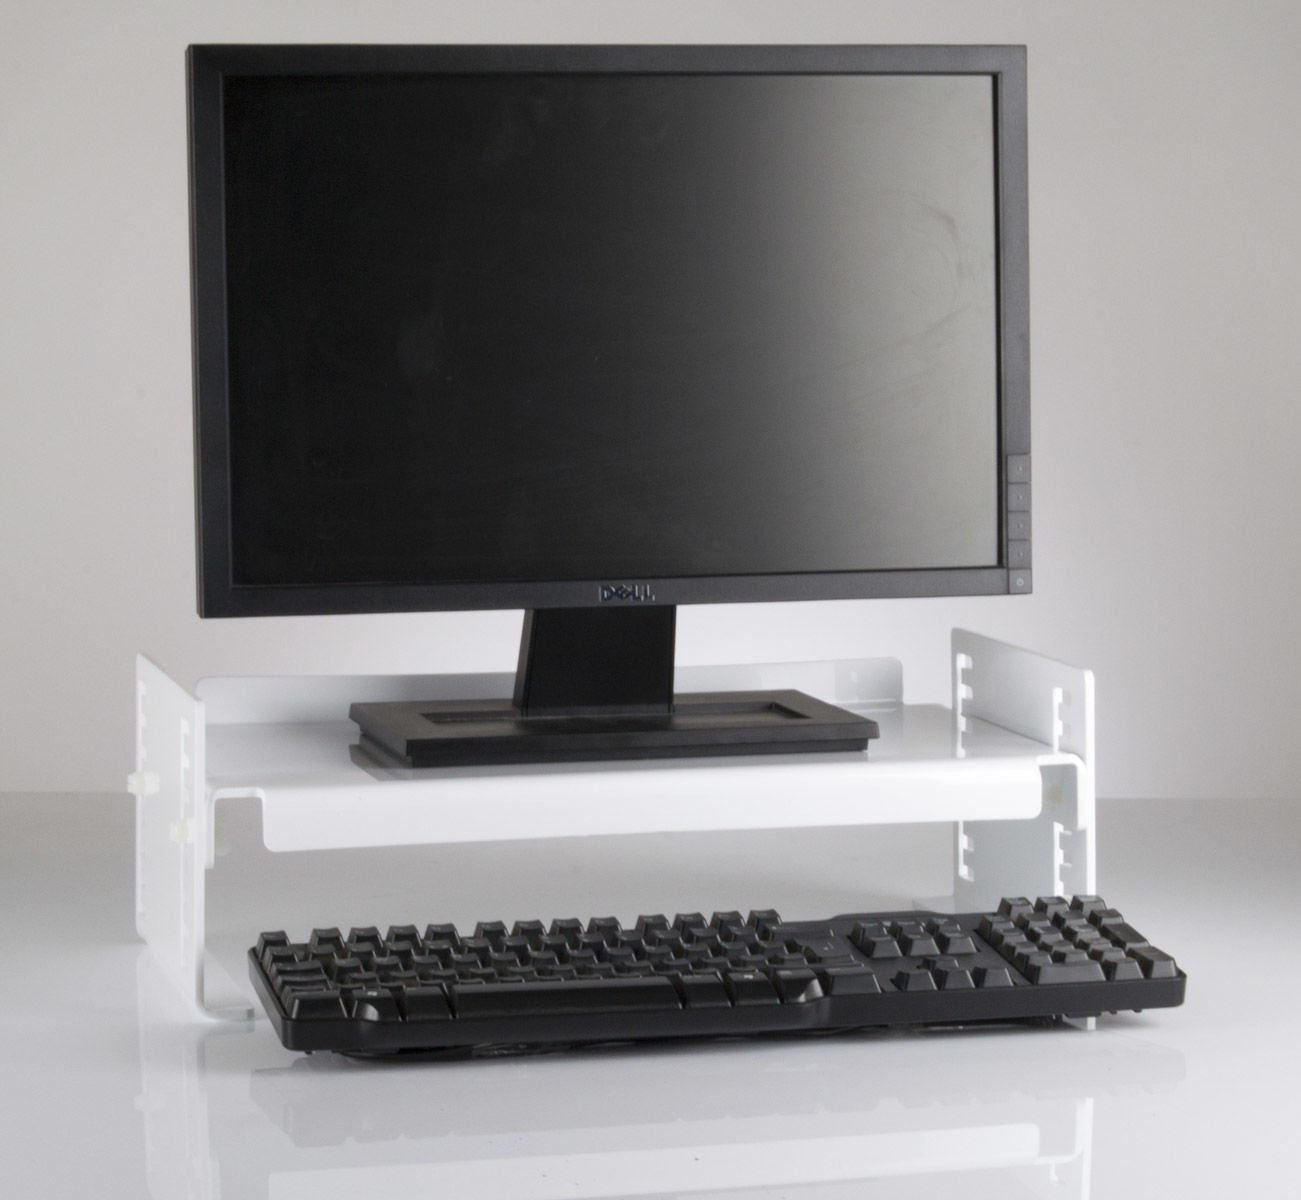 Desktop Innovations Black Height Adjustable Monitor Stand